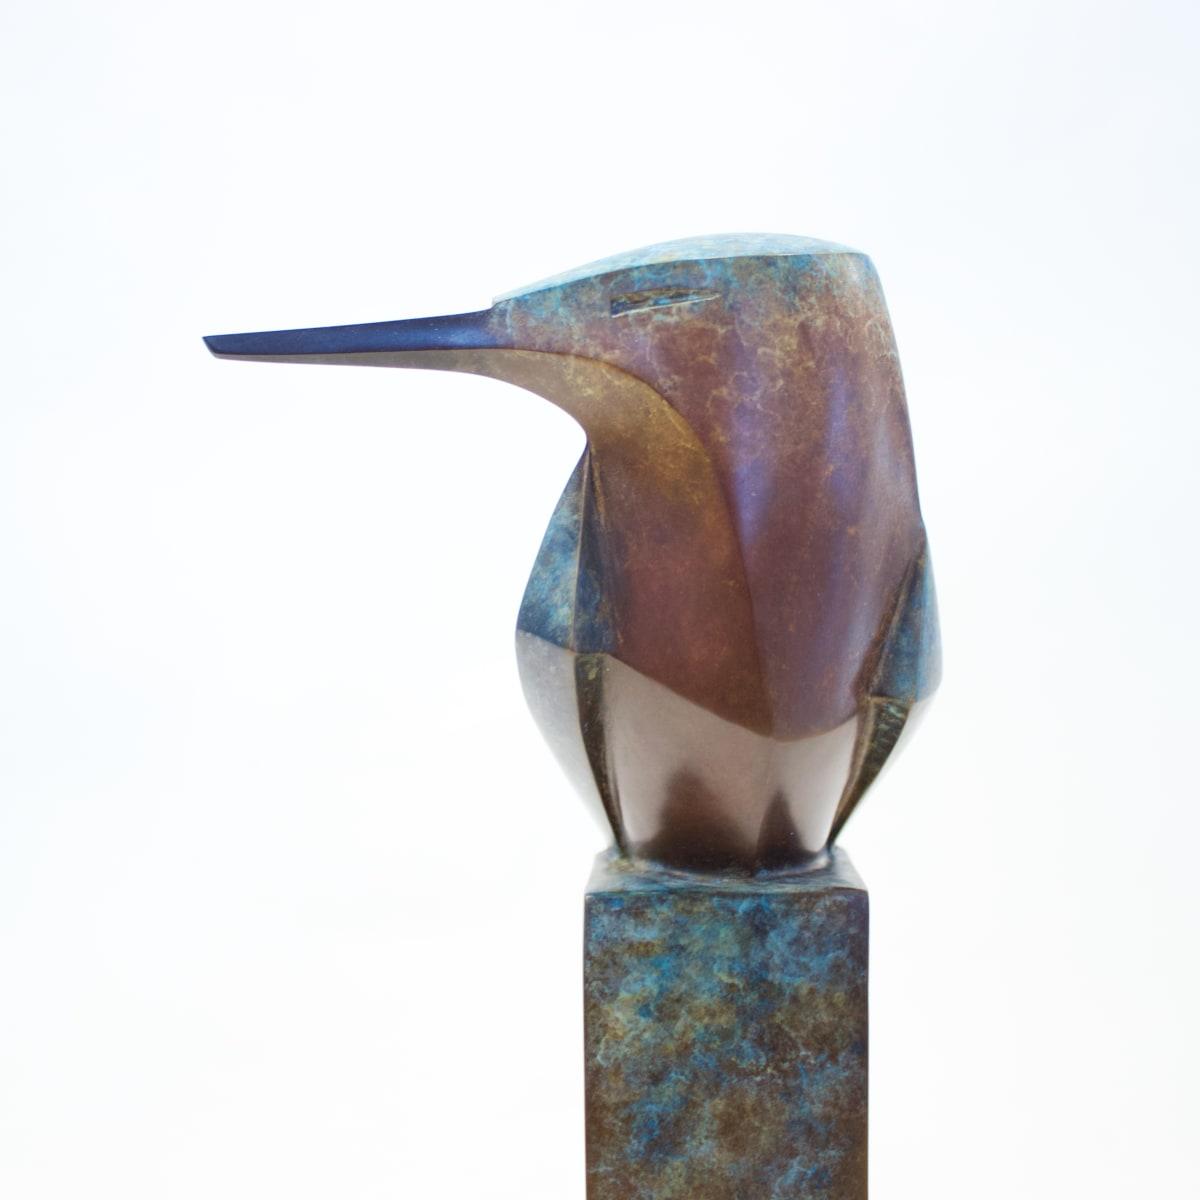 Paul Harvey Kingfisher, 2019 Bronze Sculpture 30 x 11 x 6 cm 11 3/4 x 4 3/8 x 2 3/8 in Edition 7 of 90